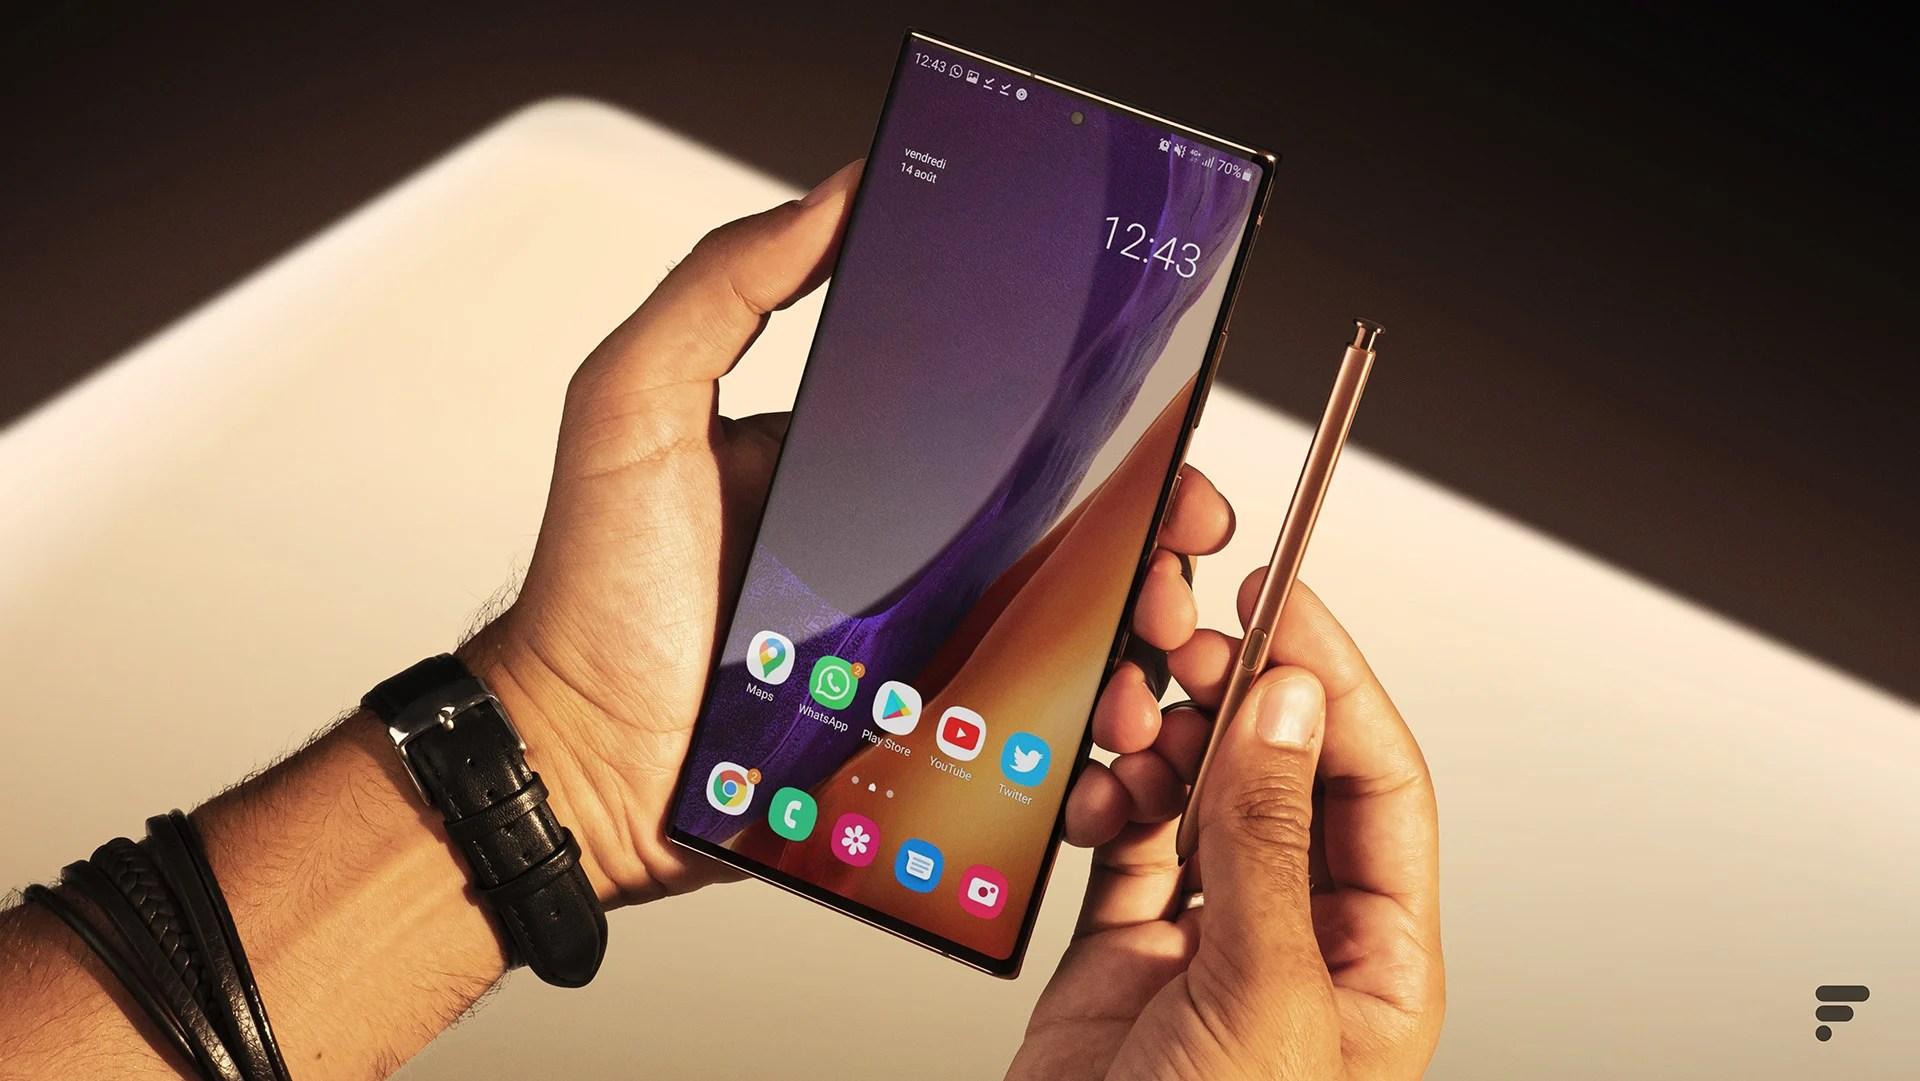 Le Samsung Galaxy S21 Ultra pourrait mettre fin au principal atout des Galaxy Note